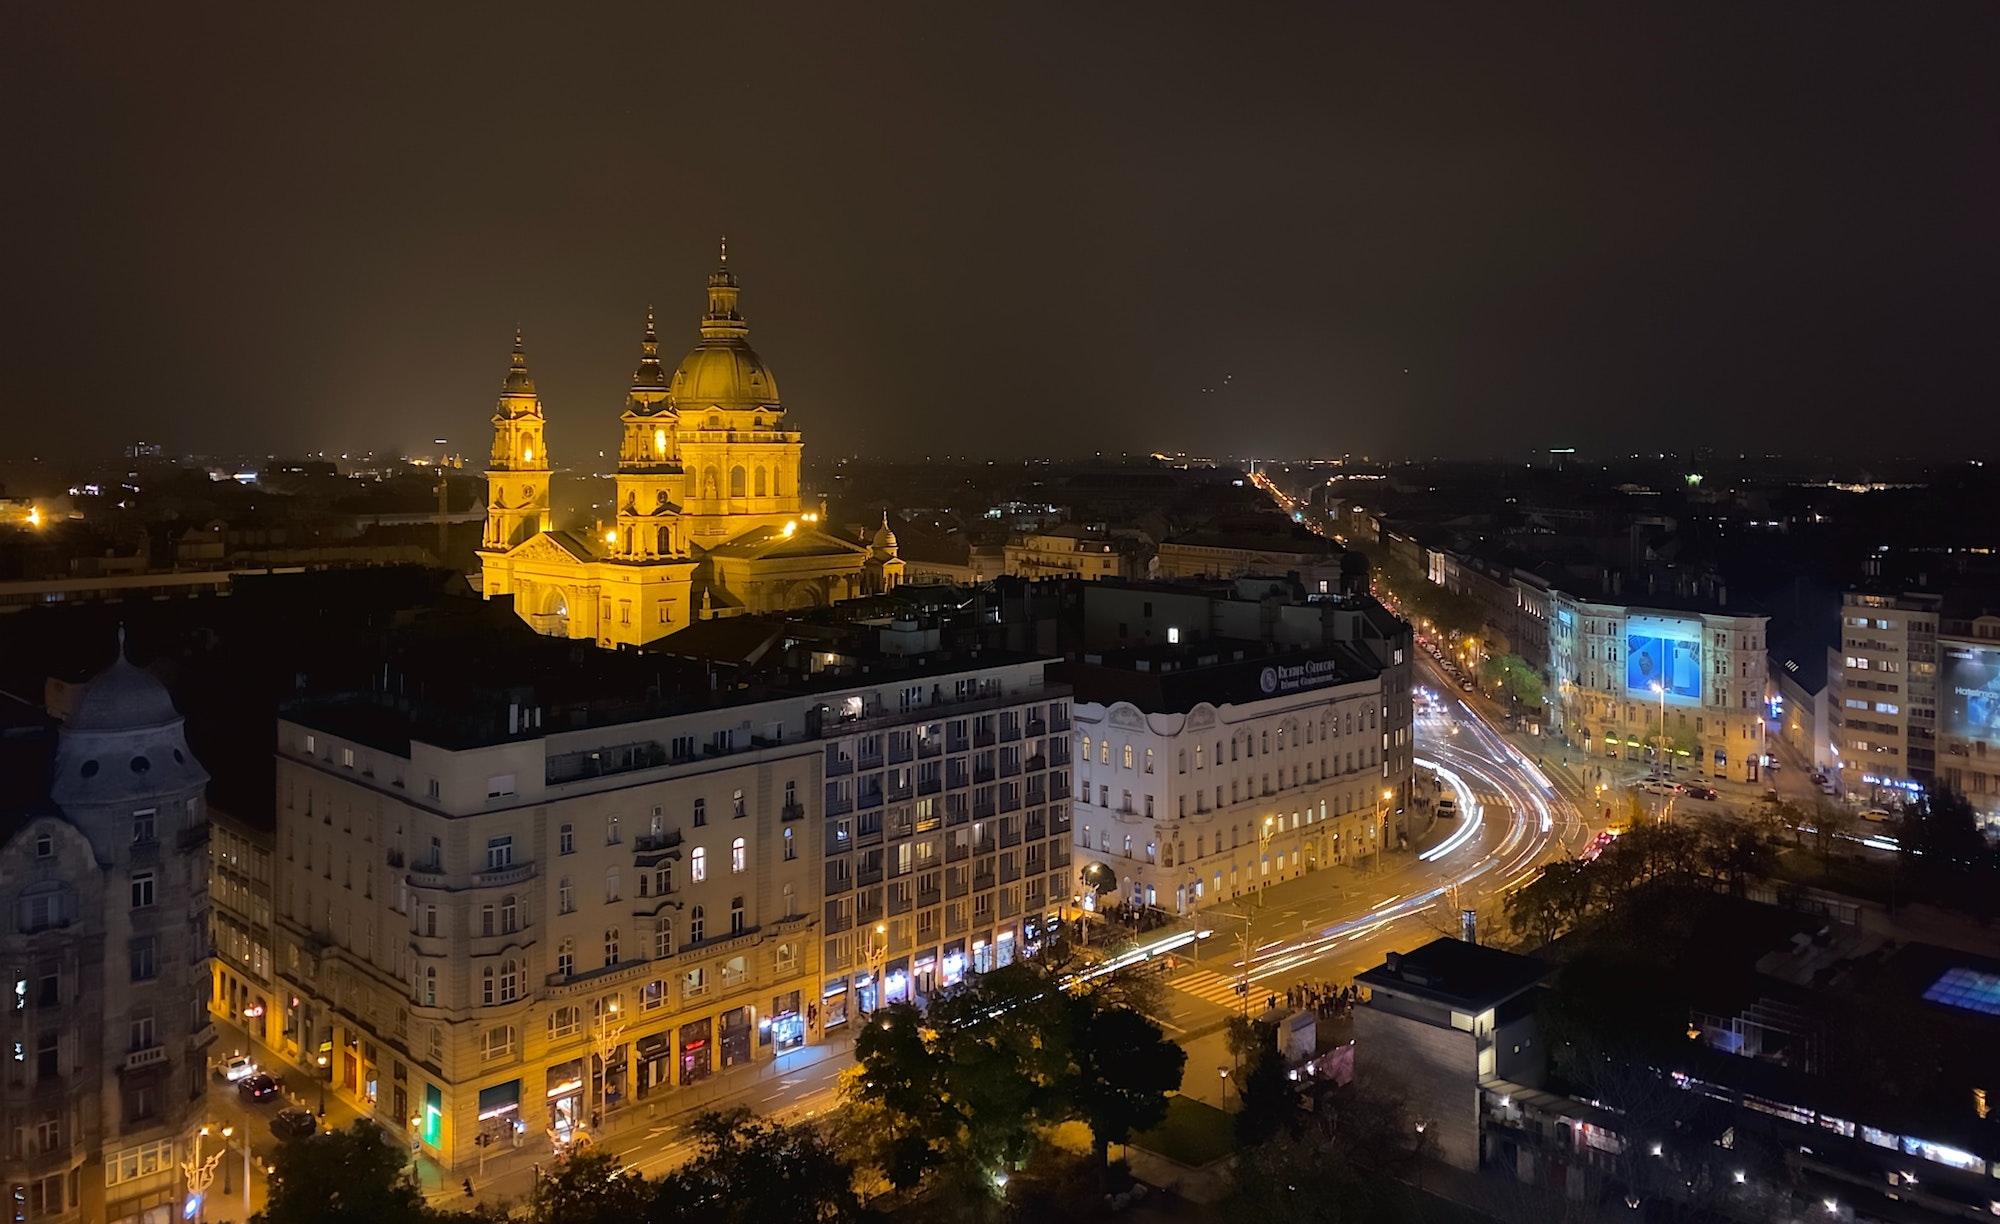 Budapest éjjel - Fotó: Sander de Vos / Unsplash